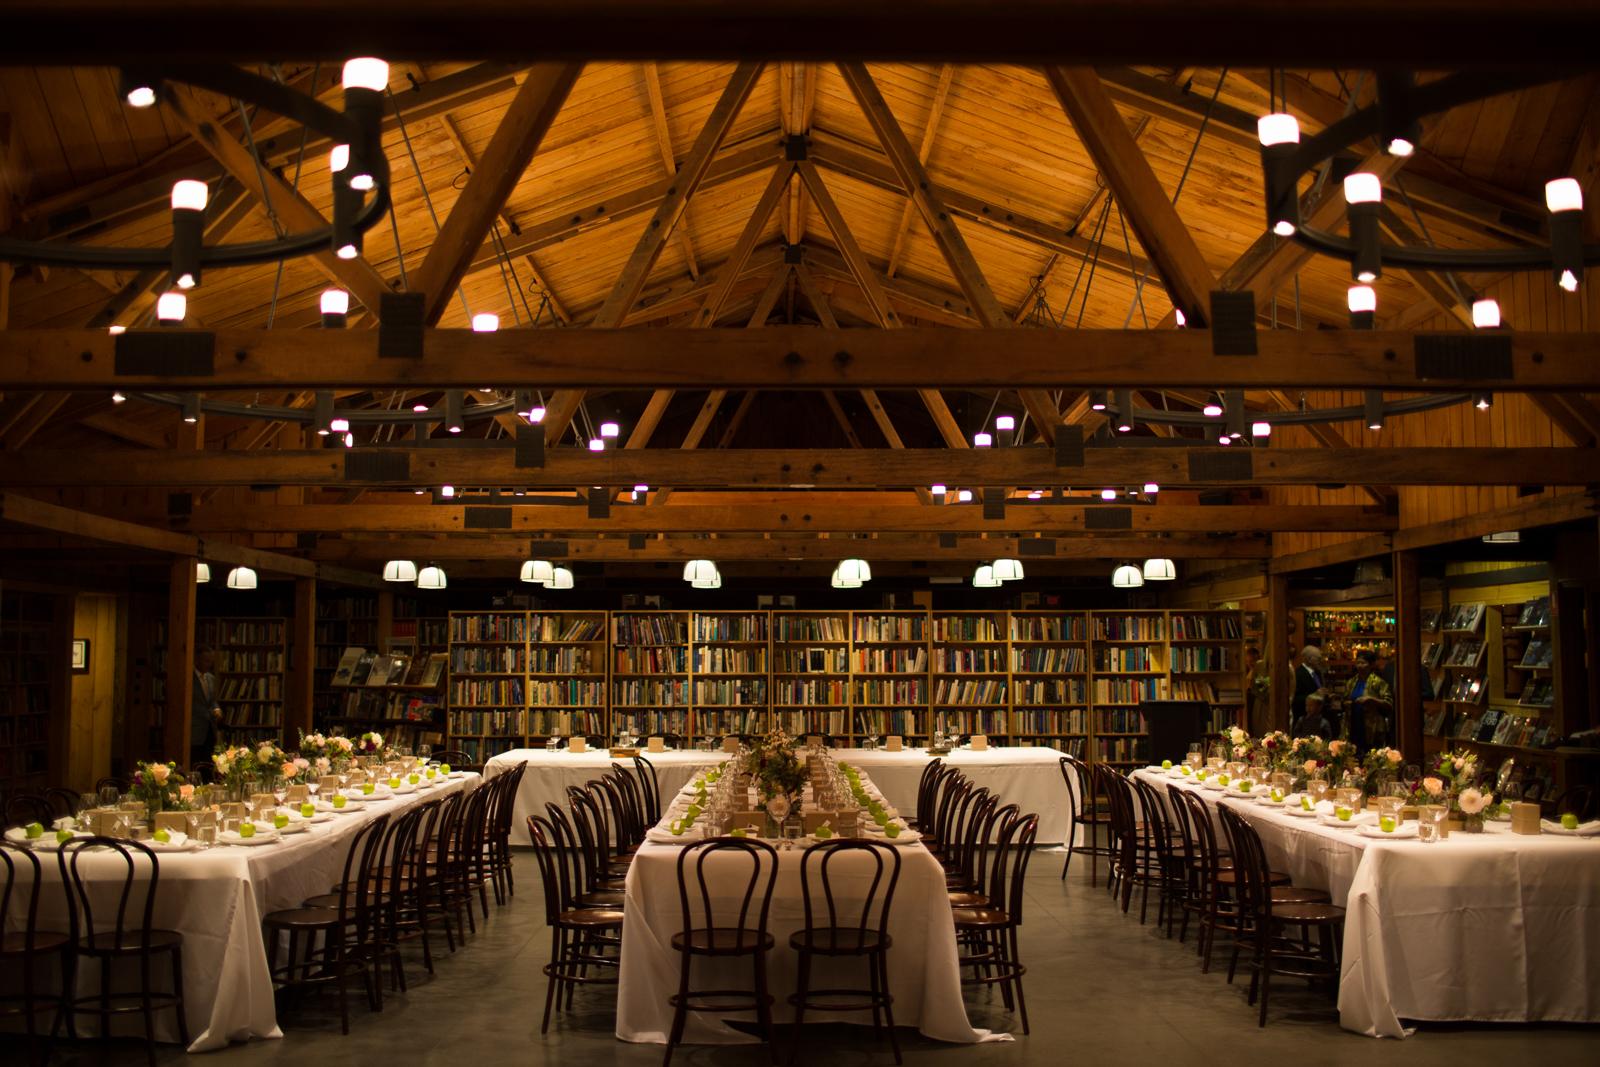 7willow_and_wolf_hugo_kirby_bowral_wedding_receptionATP_520422